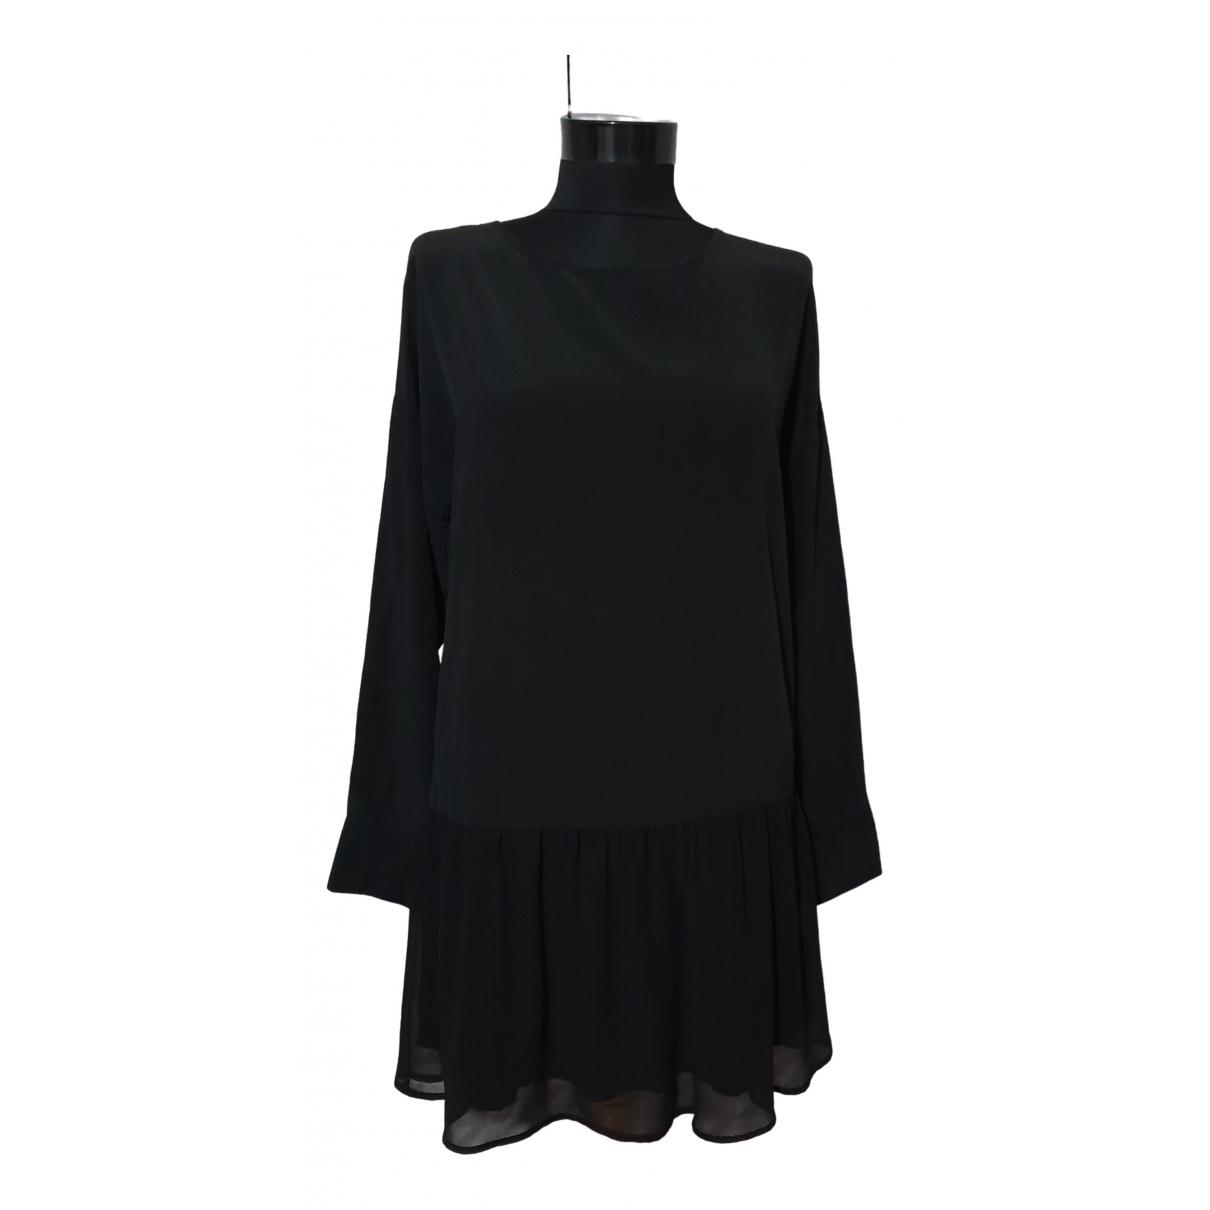 Anine Bing \N Kleid in  Schwarz Seide